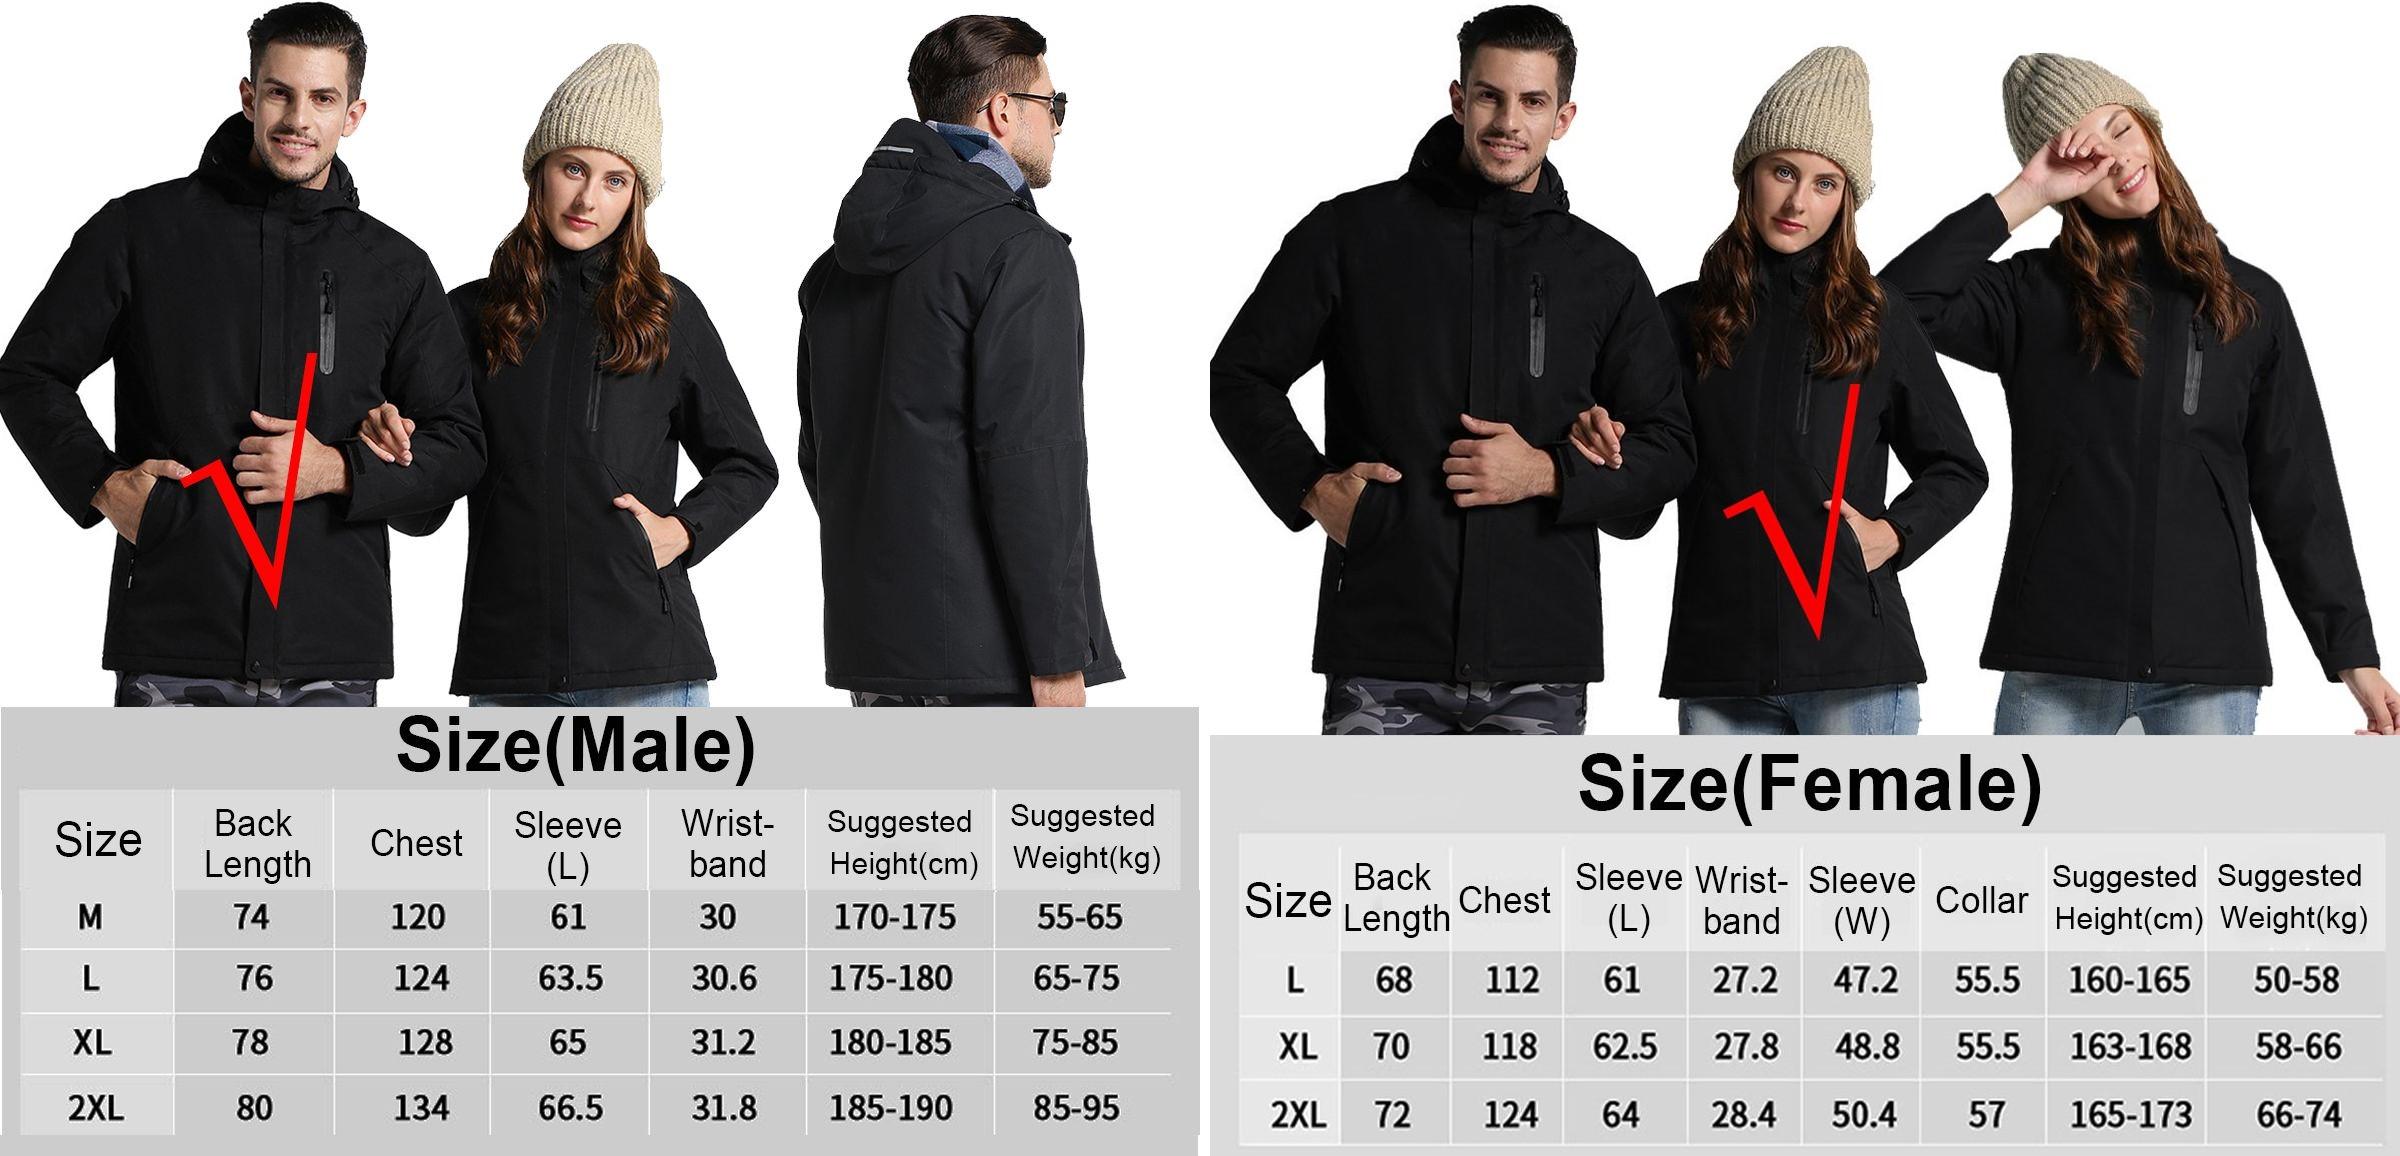 man_woman_electronic_usb_heated_jacket_intelligent_heating_7.jpg